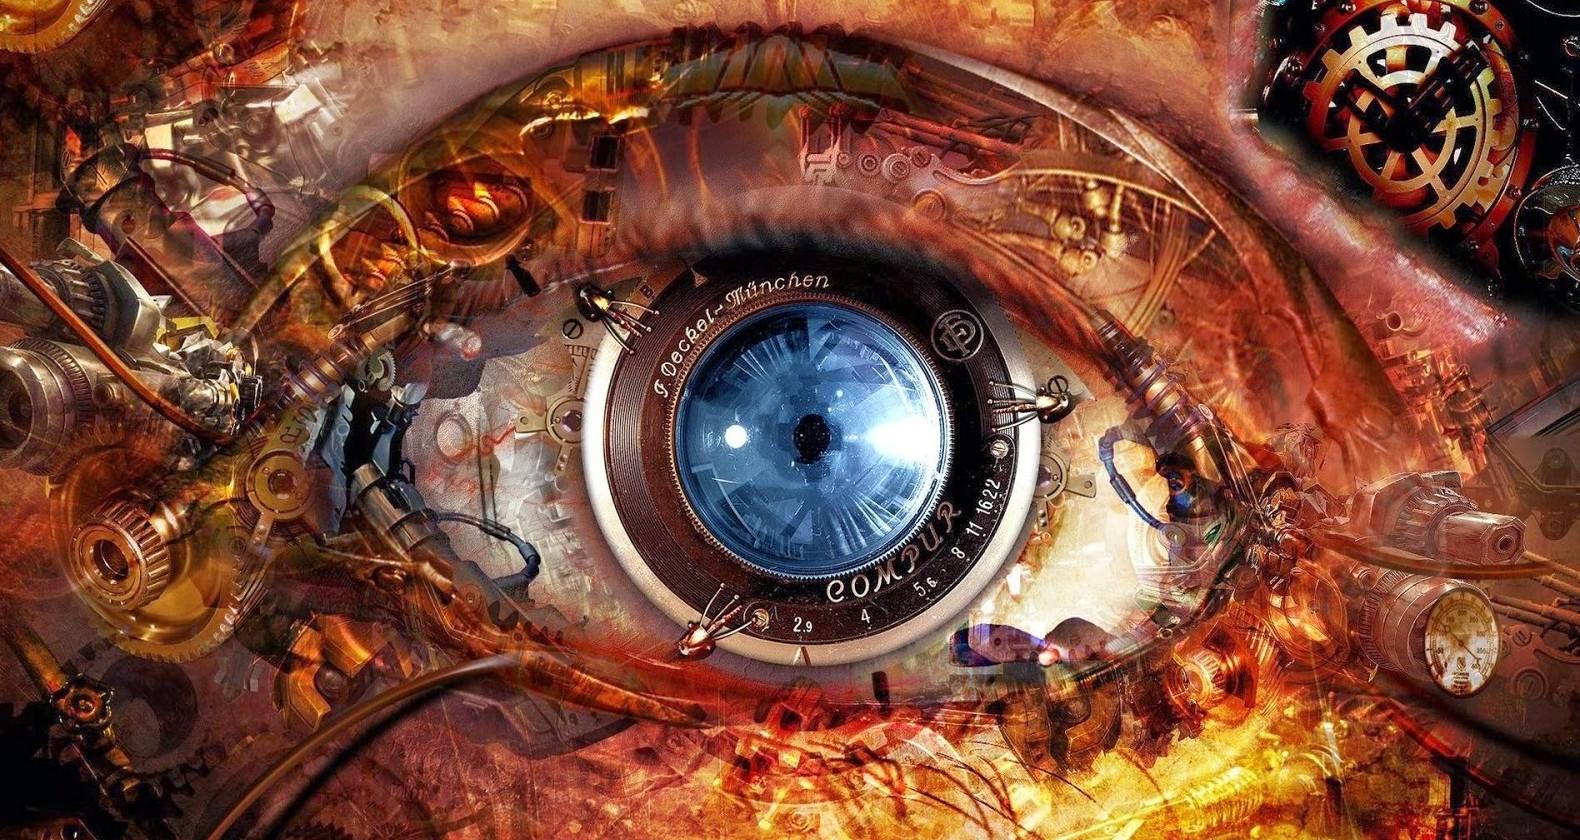 jorge-lizama-cybermedios-tecnologia-digital-dispositivo-vs-servomecanismo